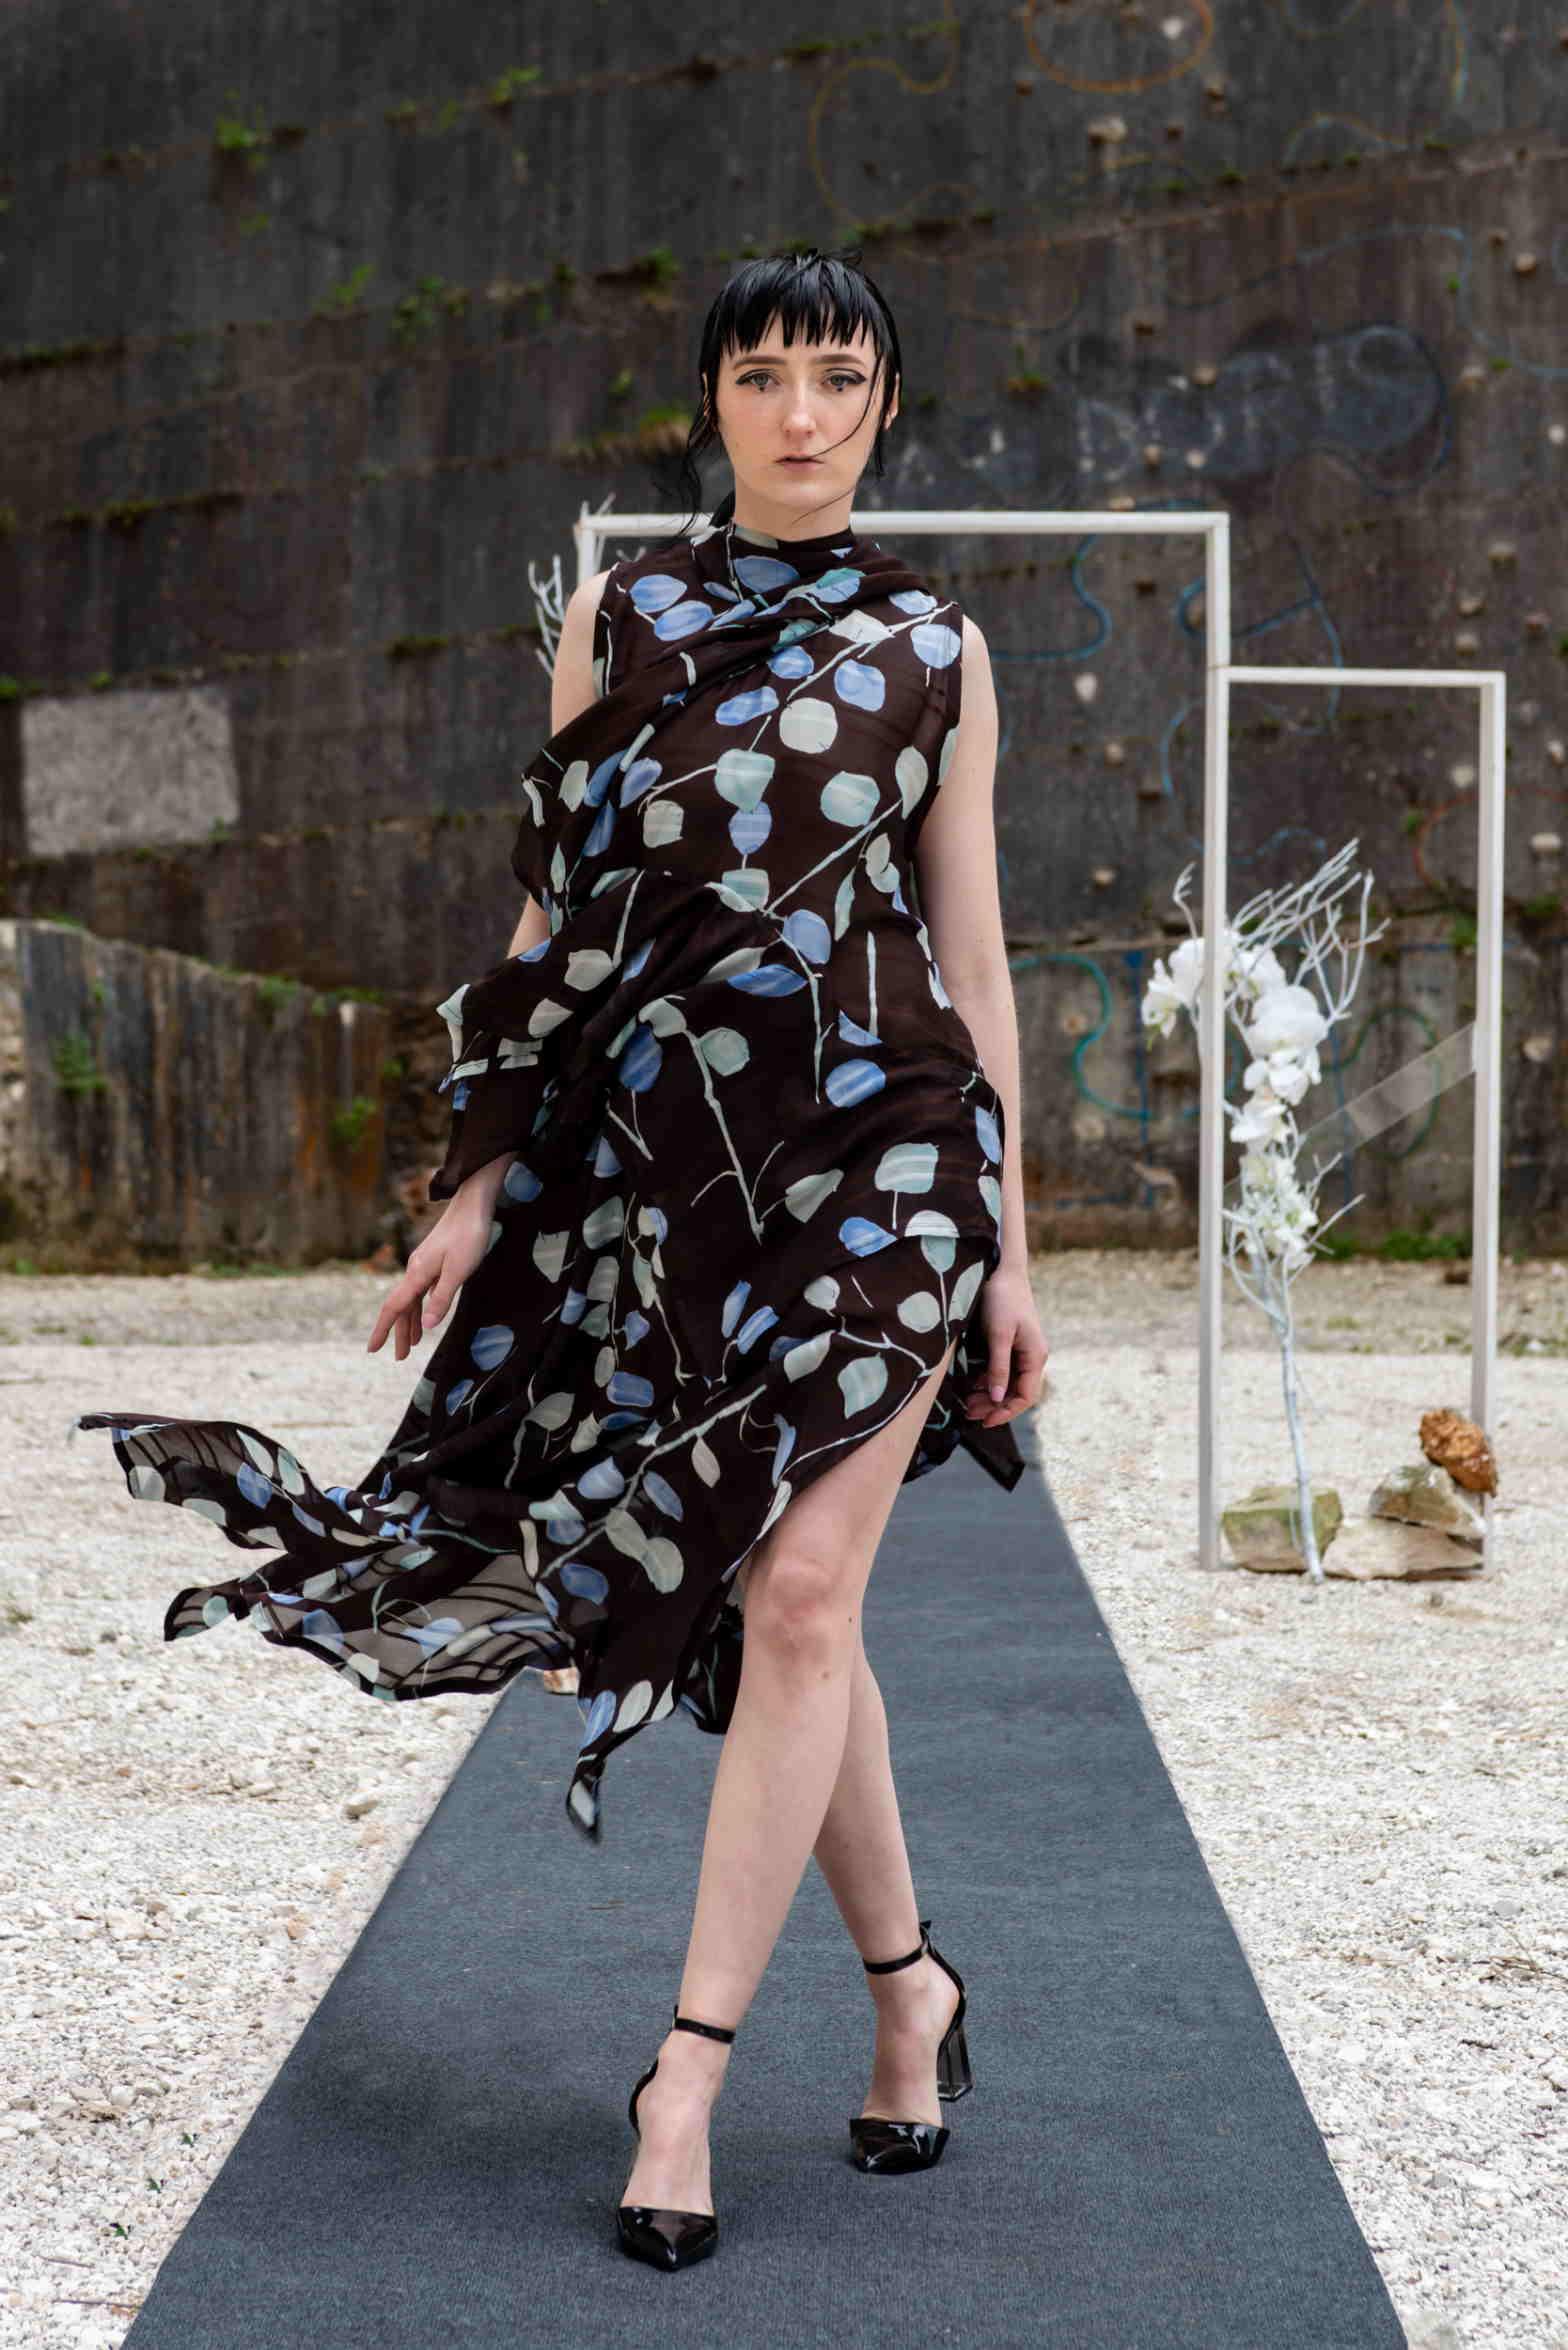 11. modna manifestacija projekta LOOK @ ME u Istri